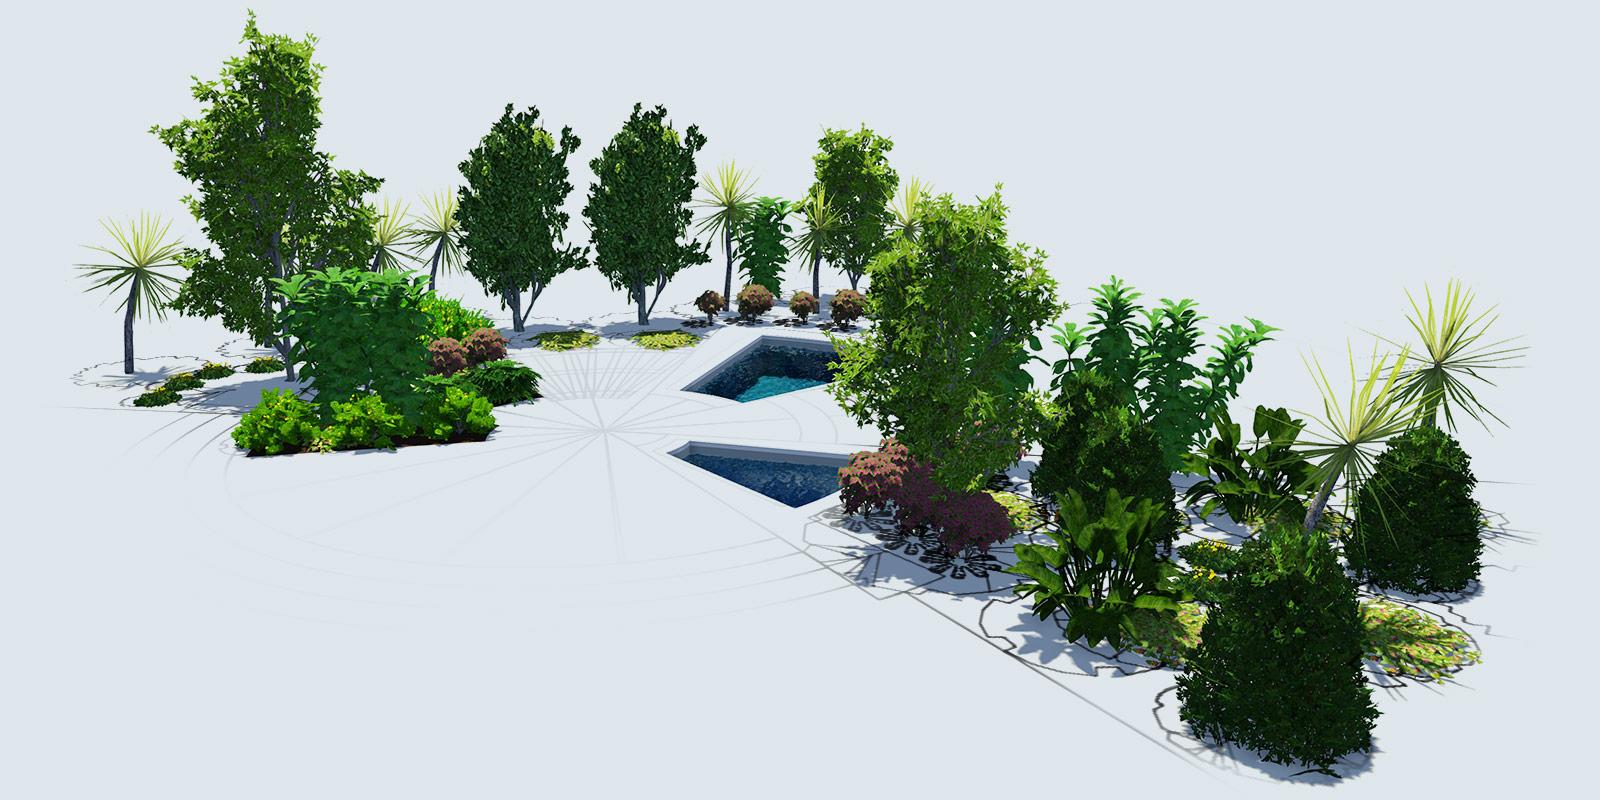 3D Landscape Design Software Plants and Trees - Vip3D